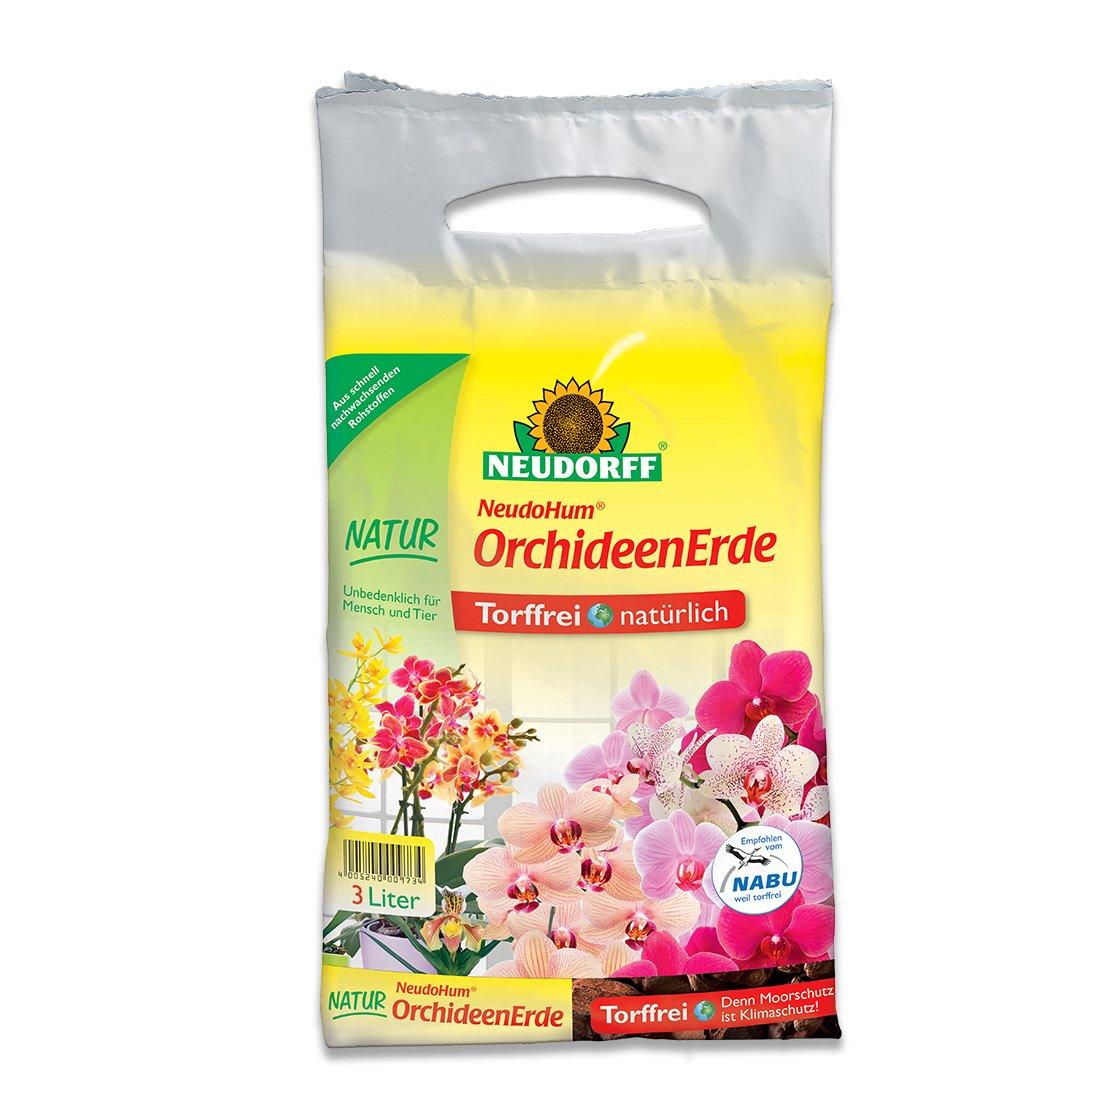 Neudorff NeudoHum OrchideenErde Orchideen umtopfen Spezialerde